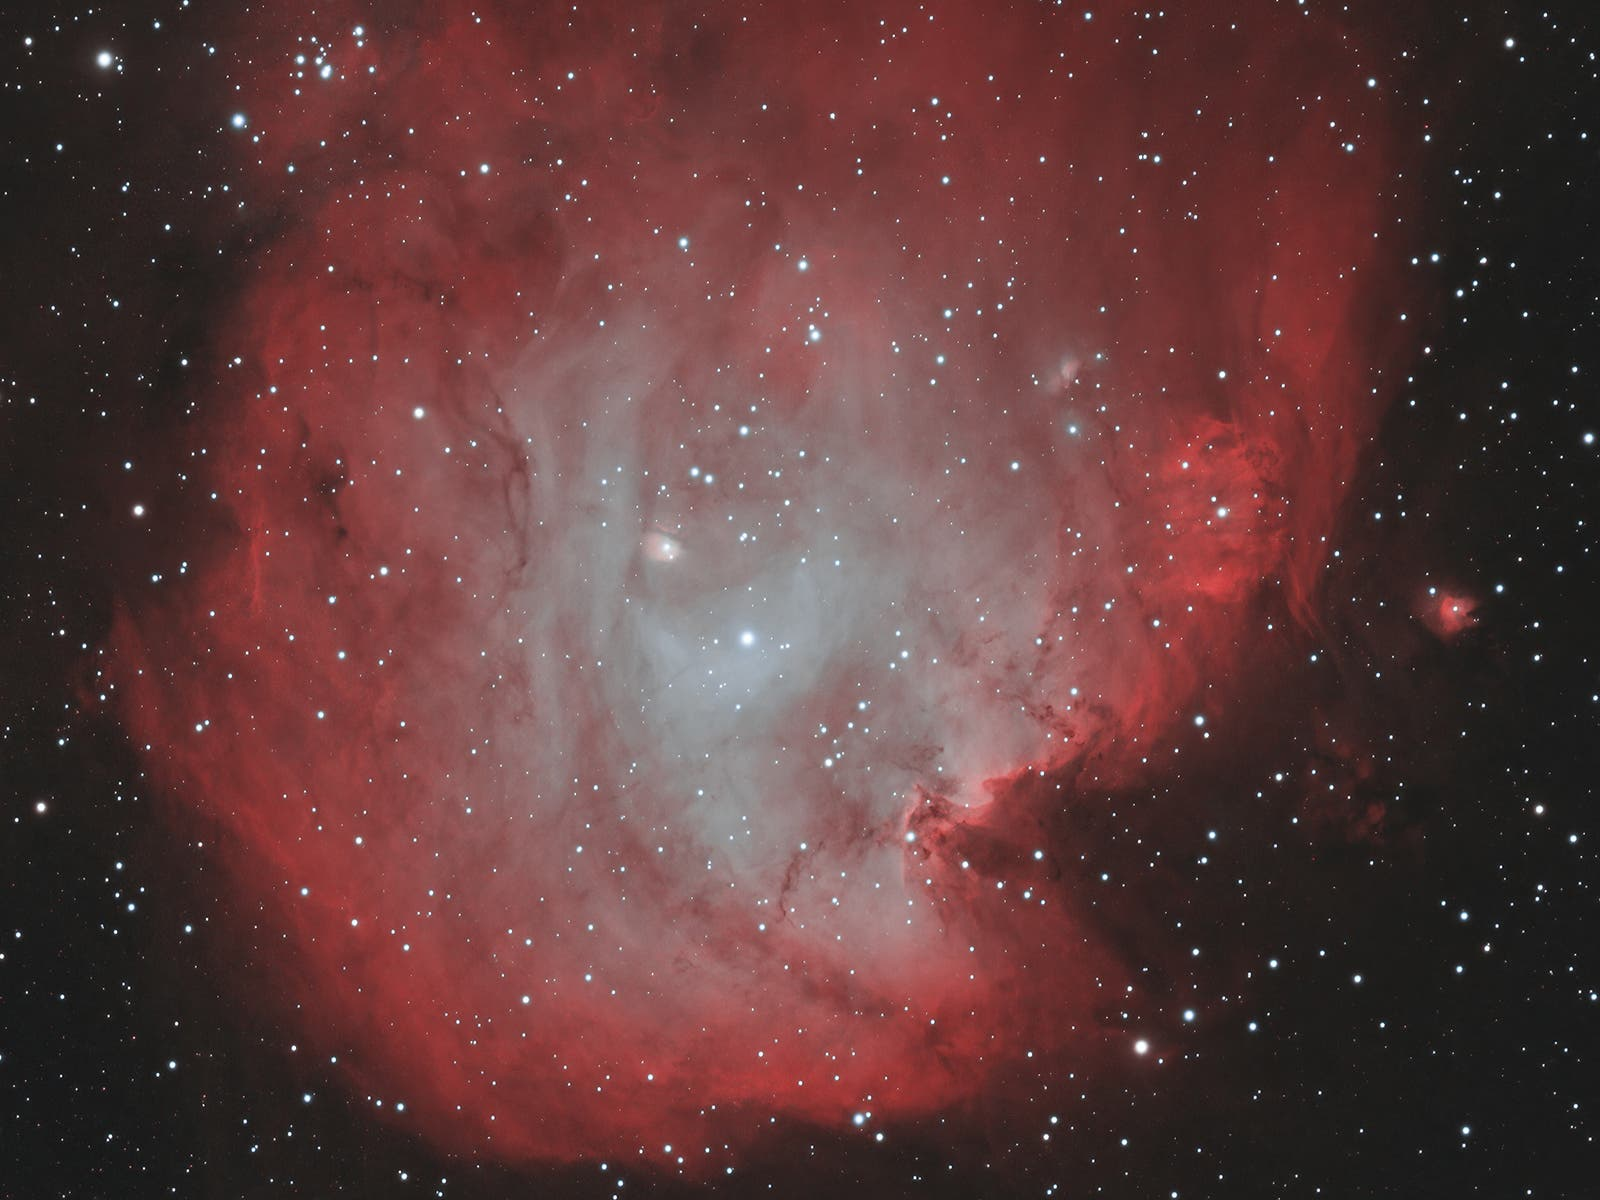 NGC 2175 im Affenkopfnebel